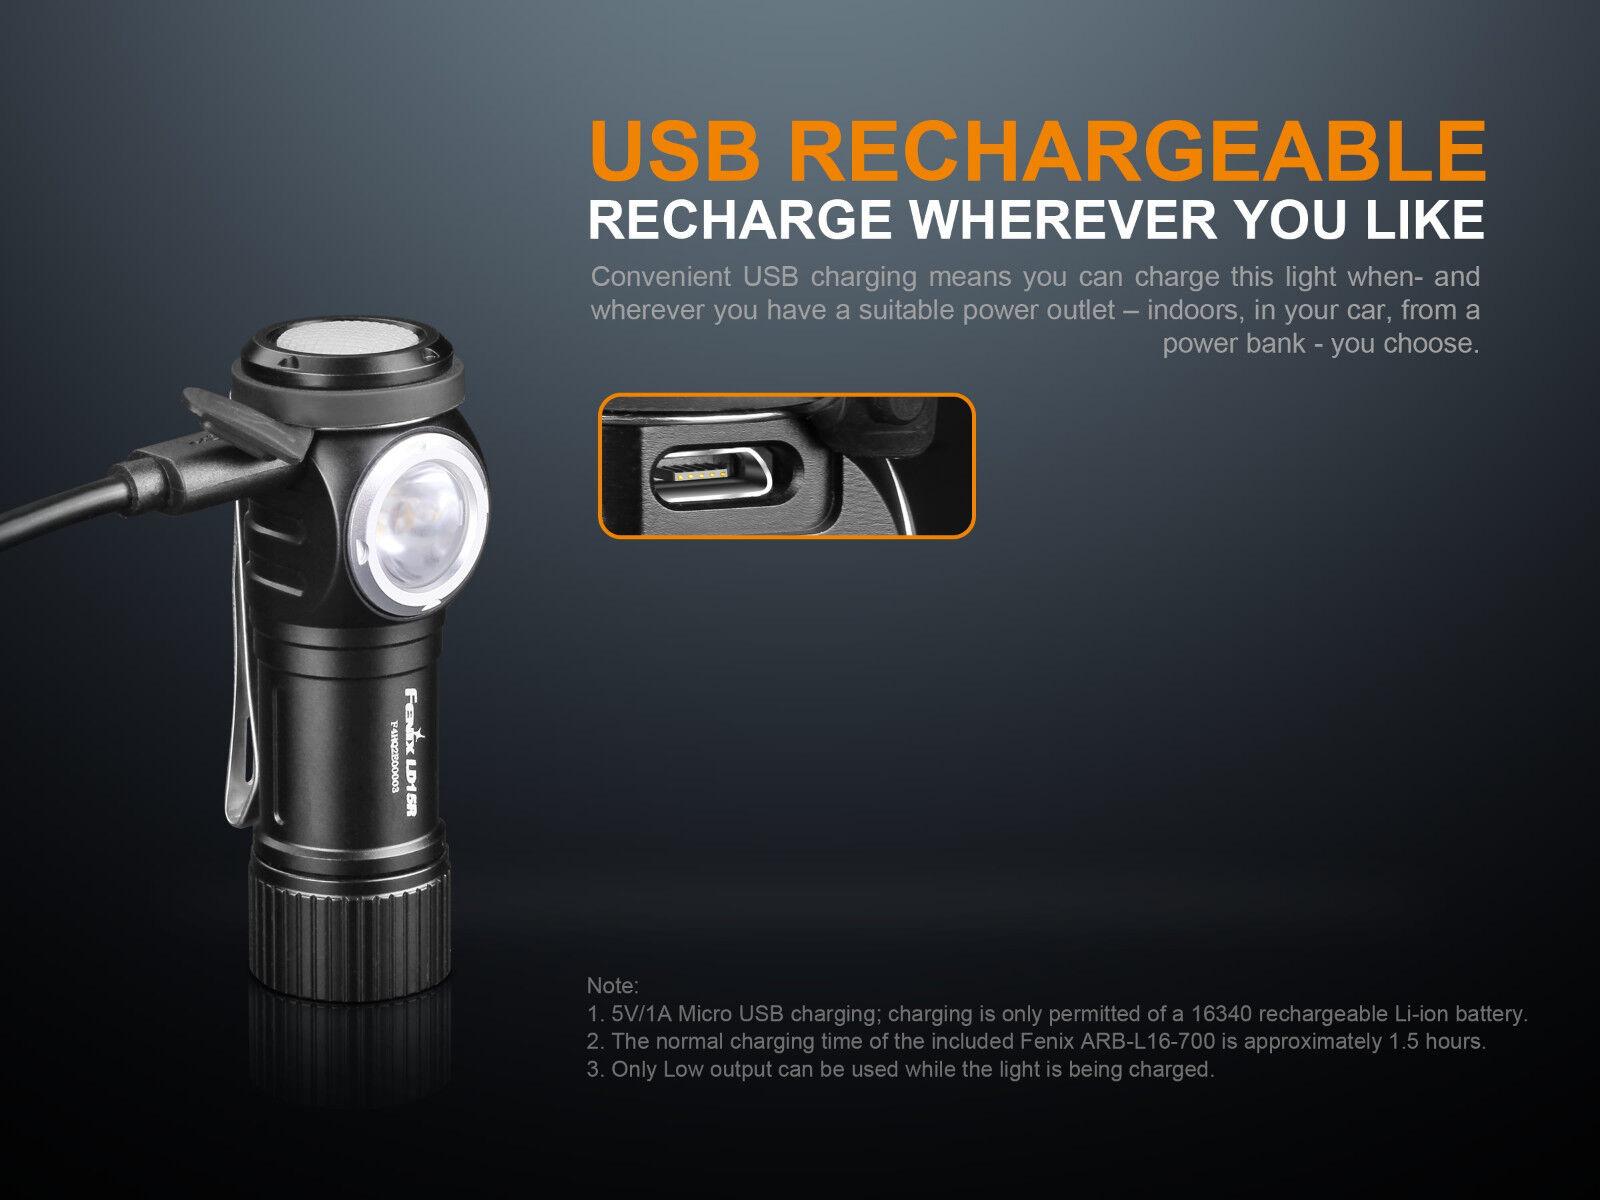 New Fenix LD15R Cree XP-G3 XP-G3 XP-G3 500 Lumens Everlight rojo LED Flashlight (NO battery) 522af0